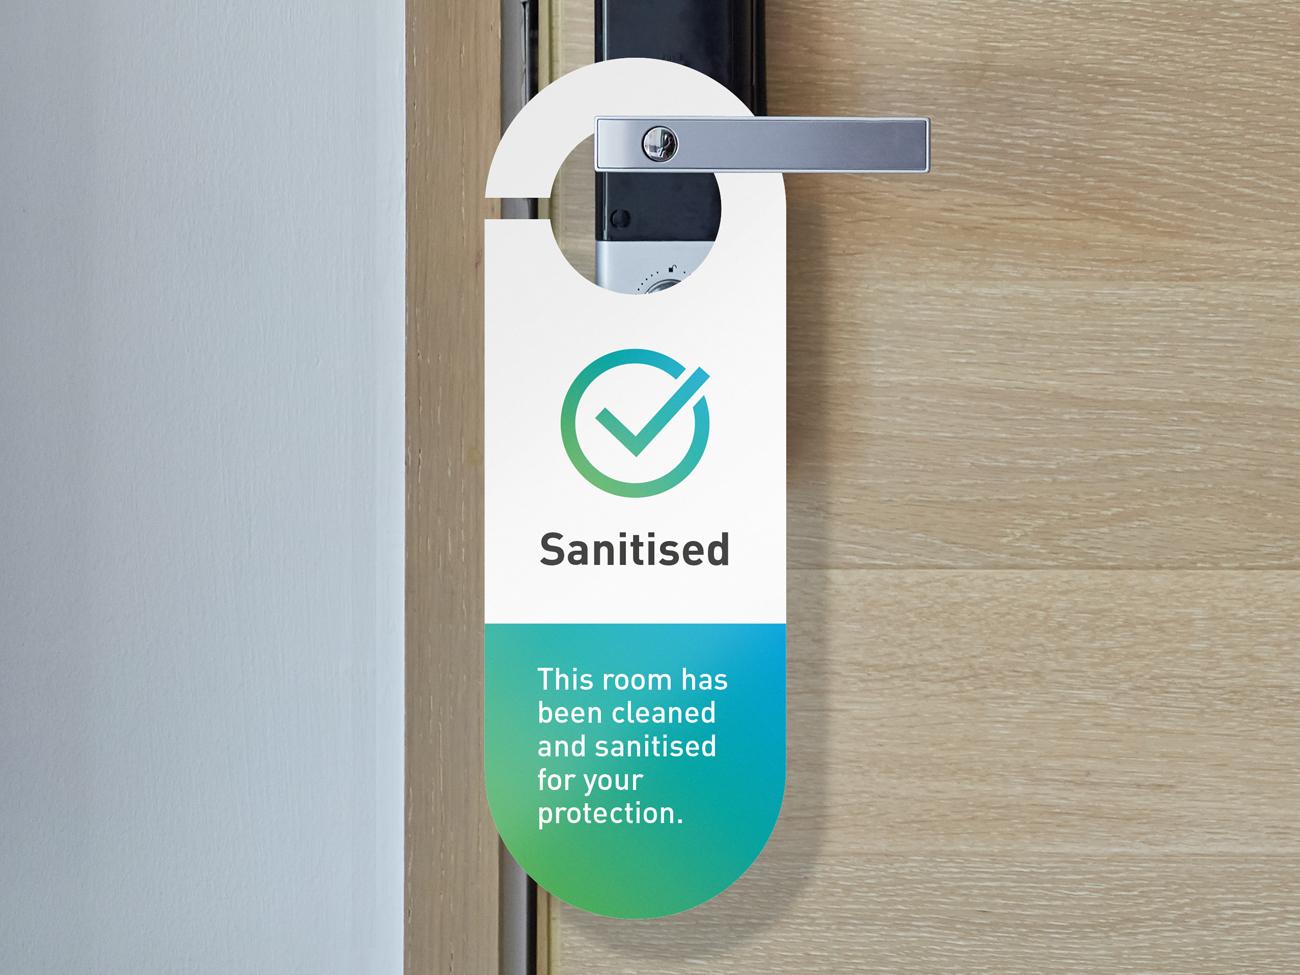 Covid Clean sanitised hotel door hanger